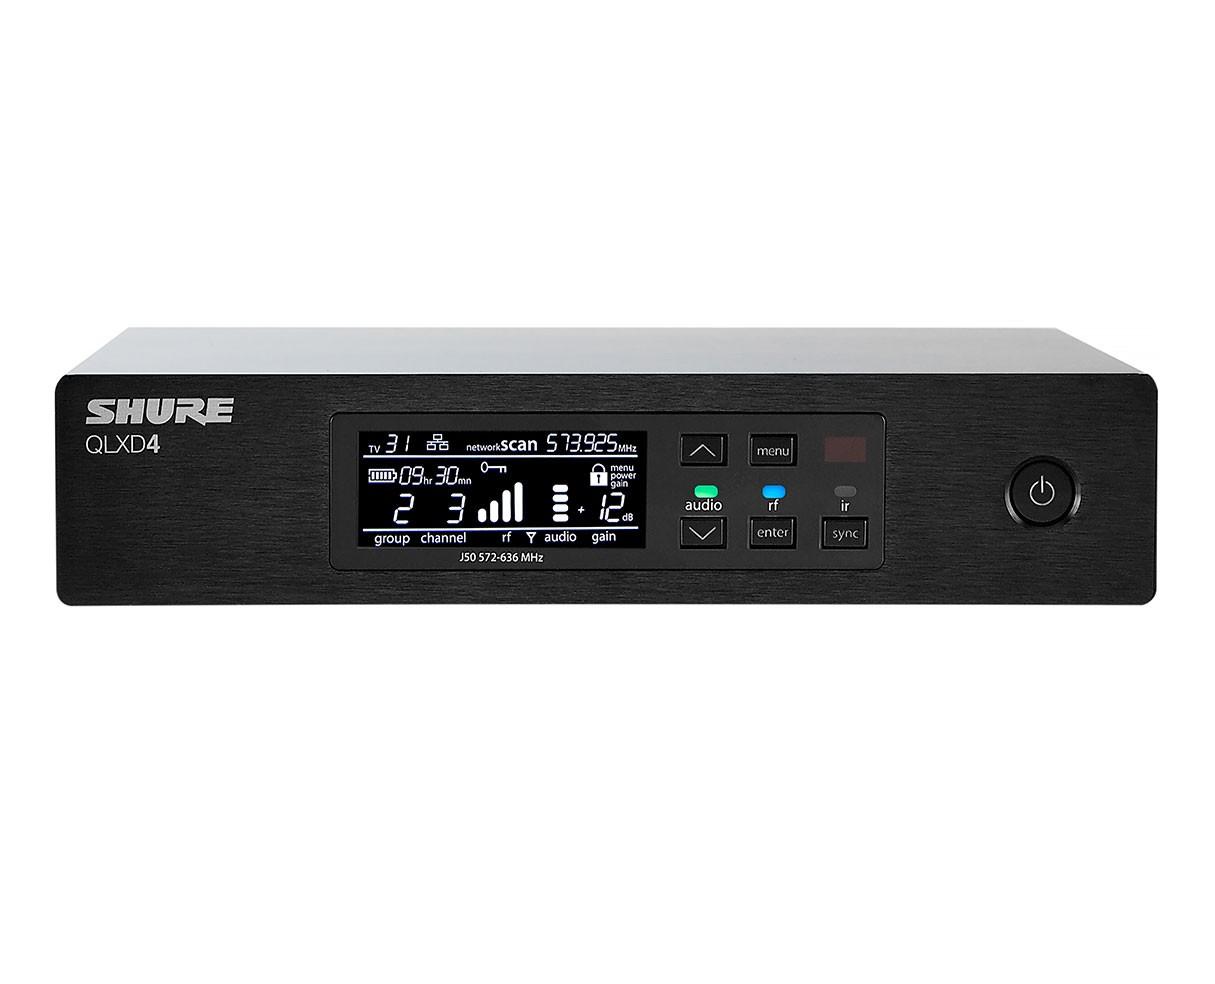 Shure QLXD4 (Band H50)